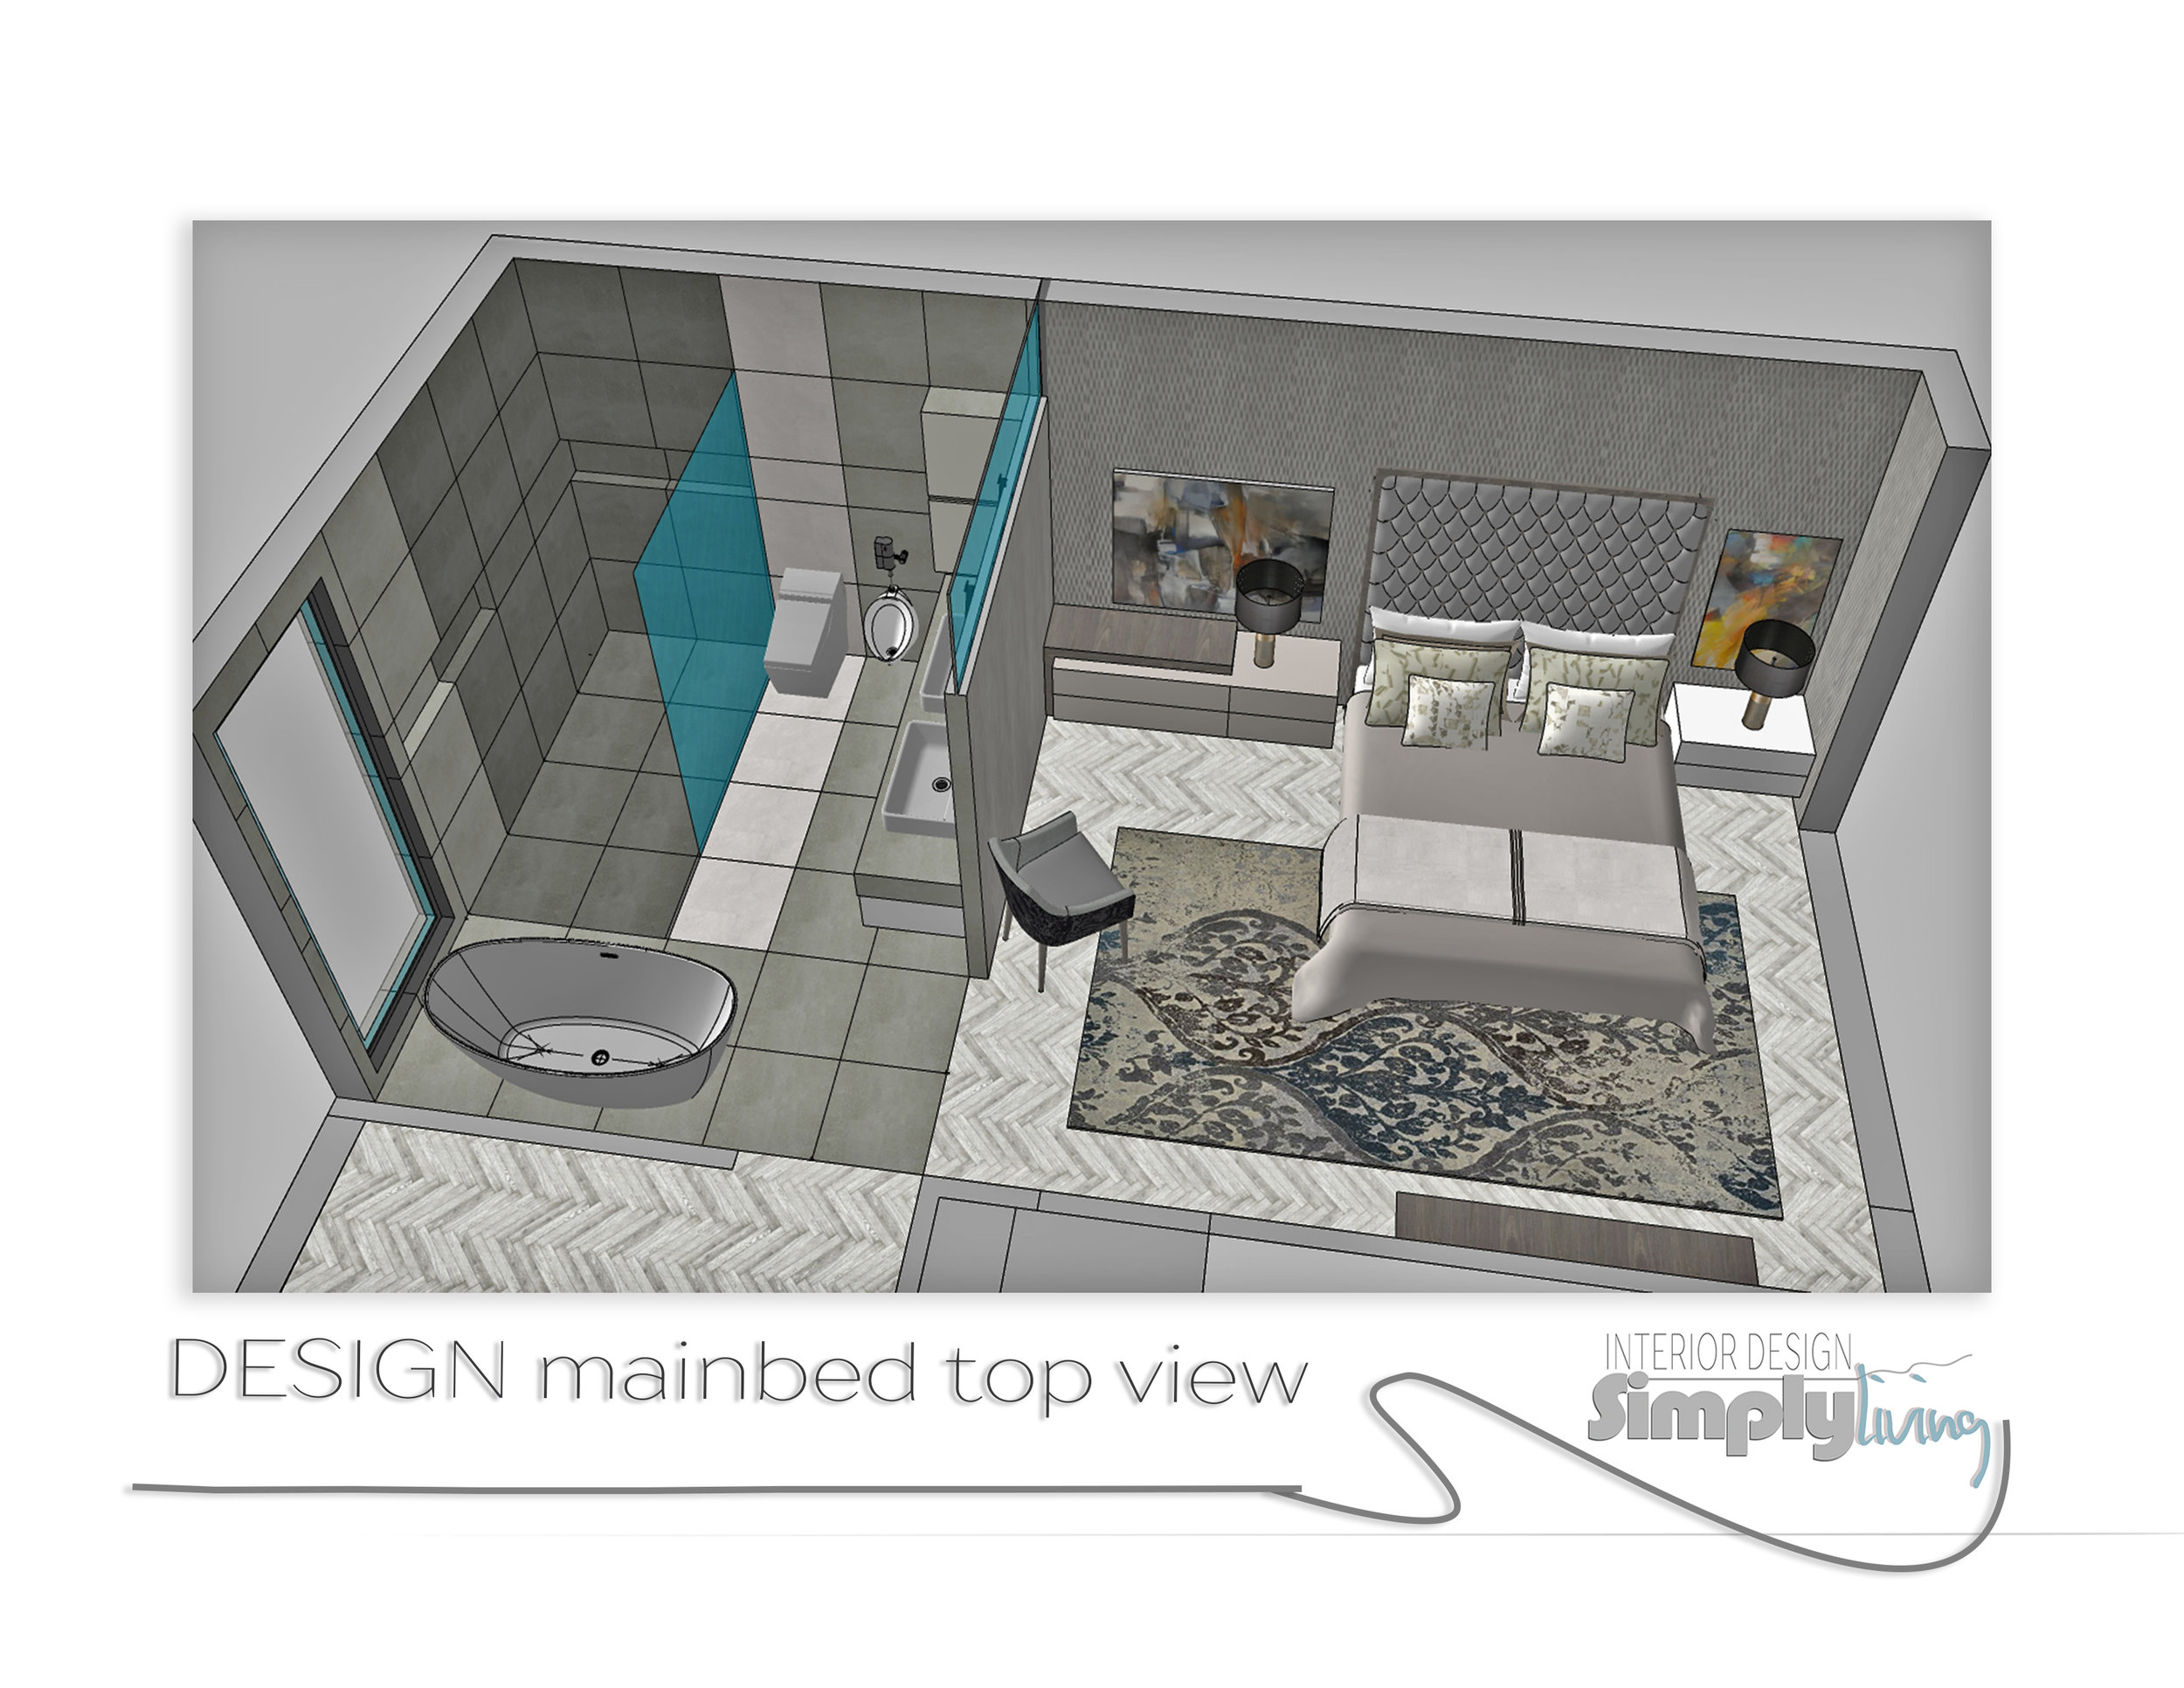 Project Alberton Main Bed Top View.jpg